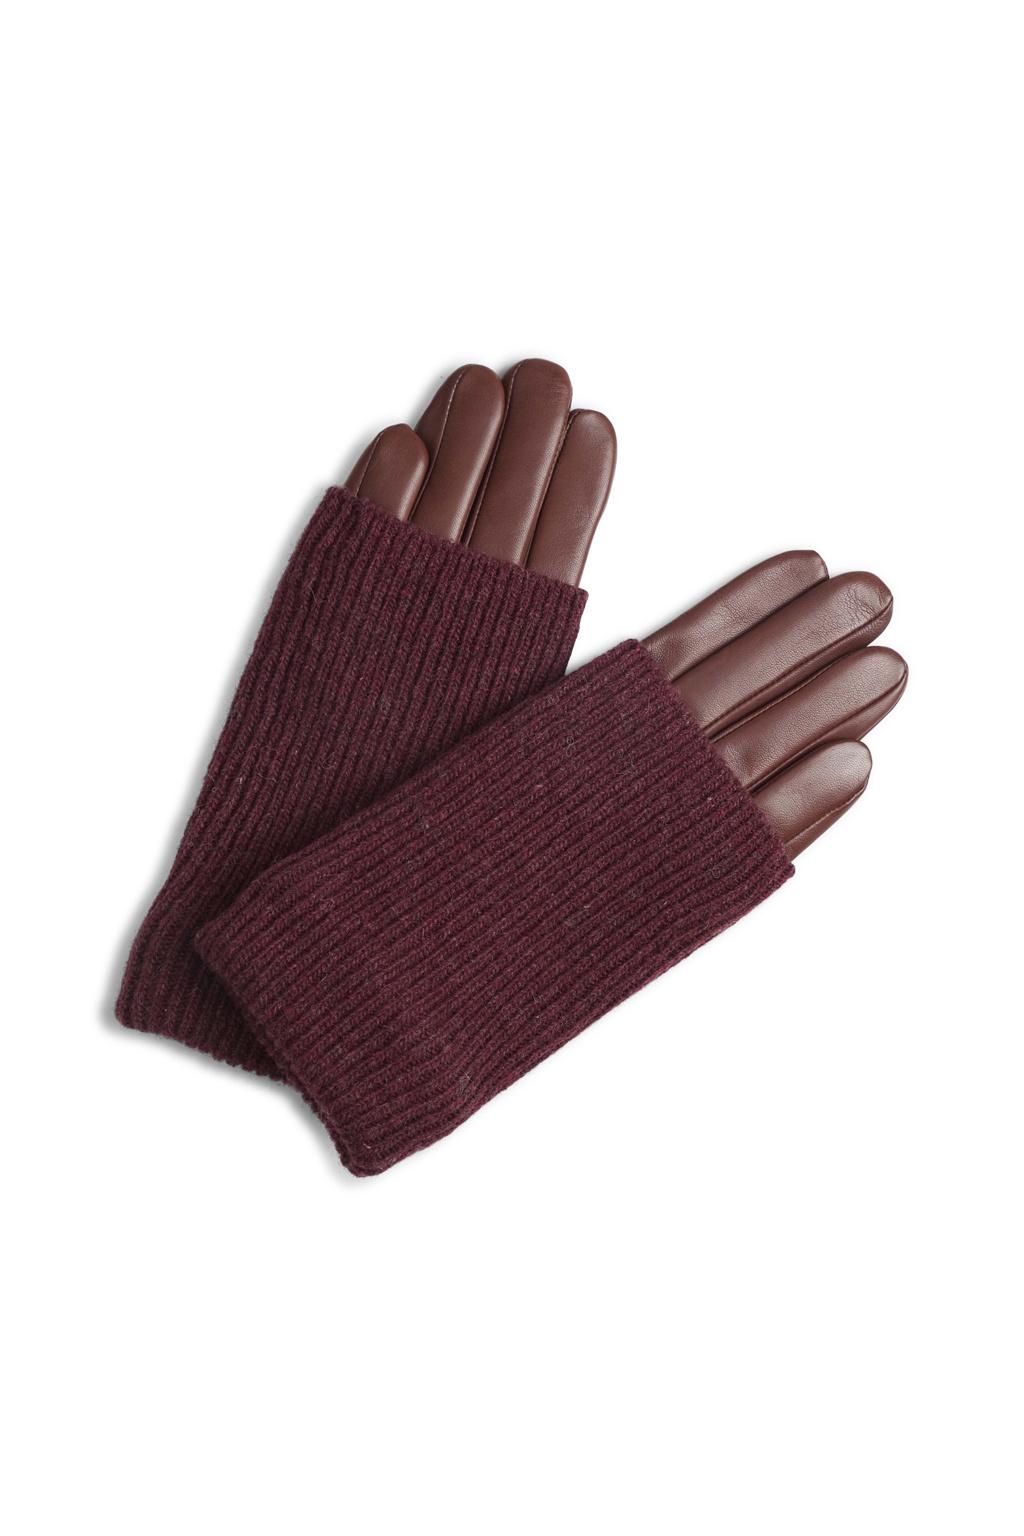 Helly Glove - Cognac w/ Burgundy-1